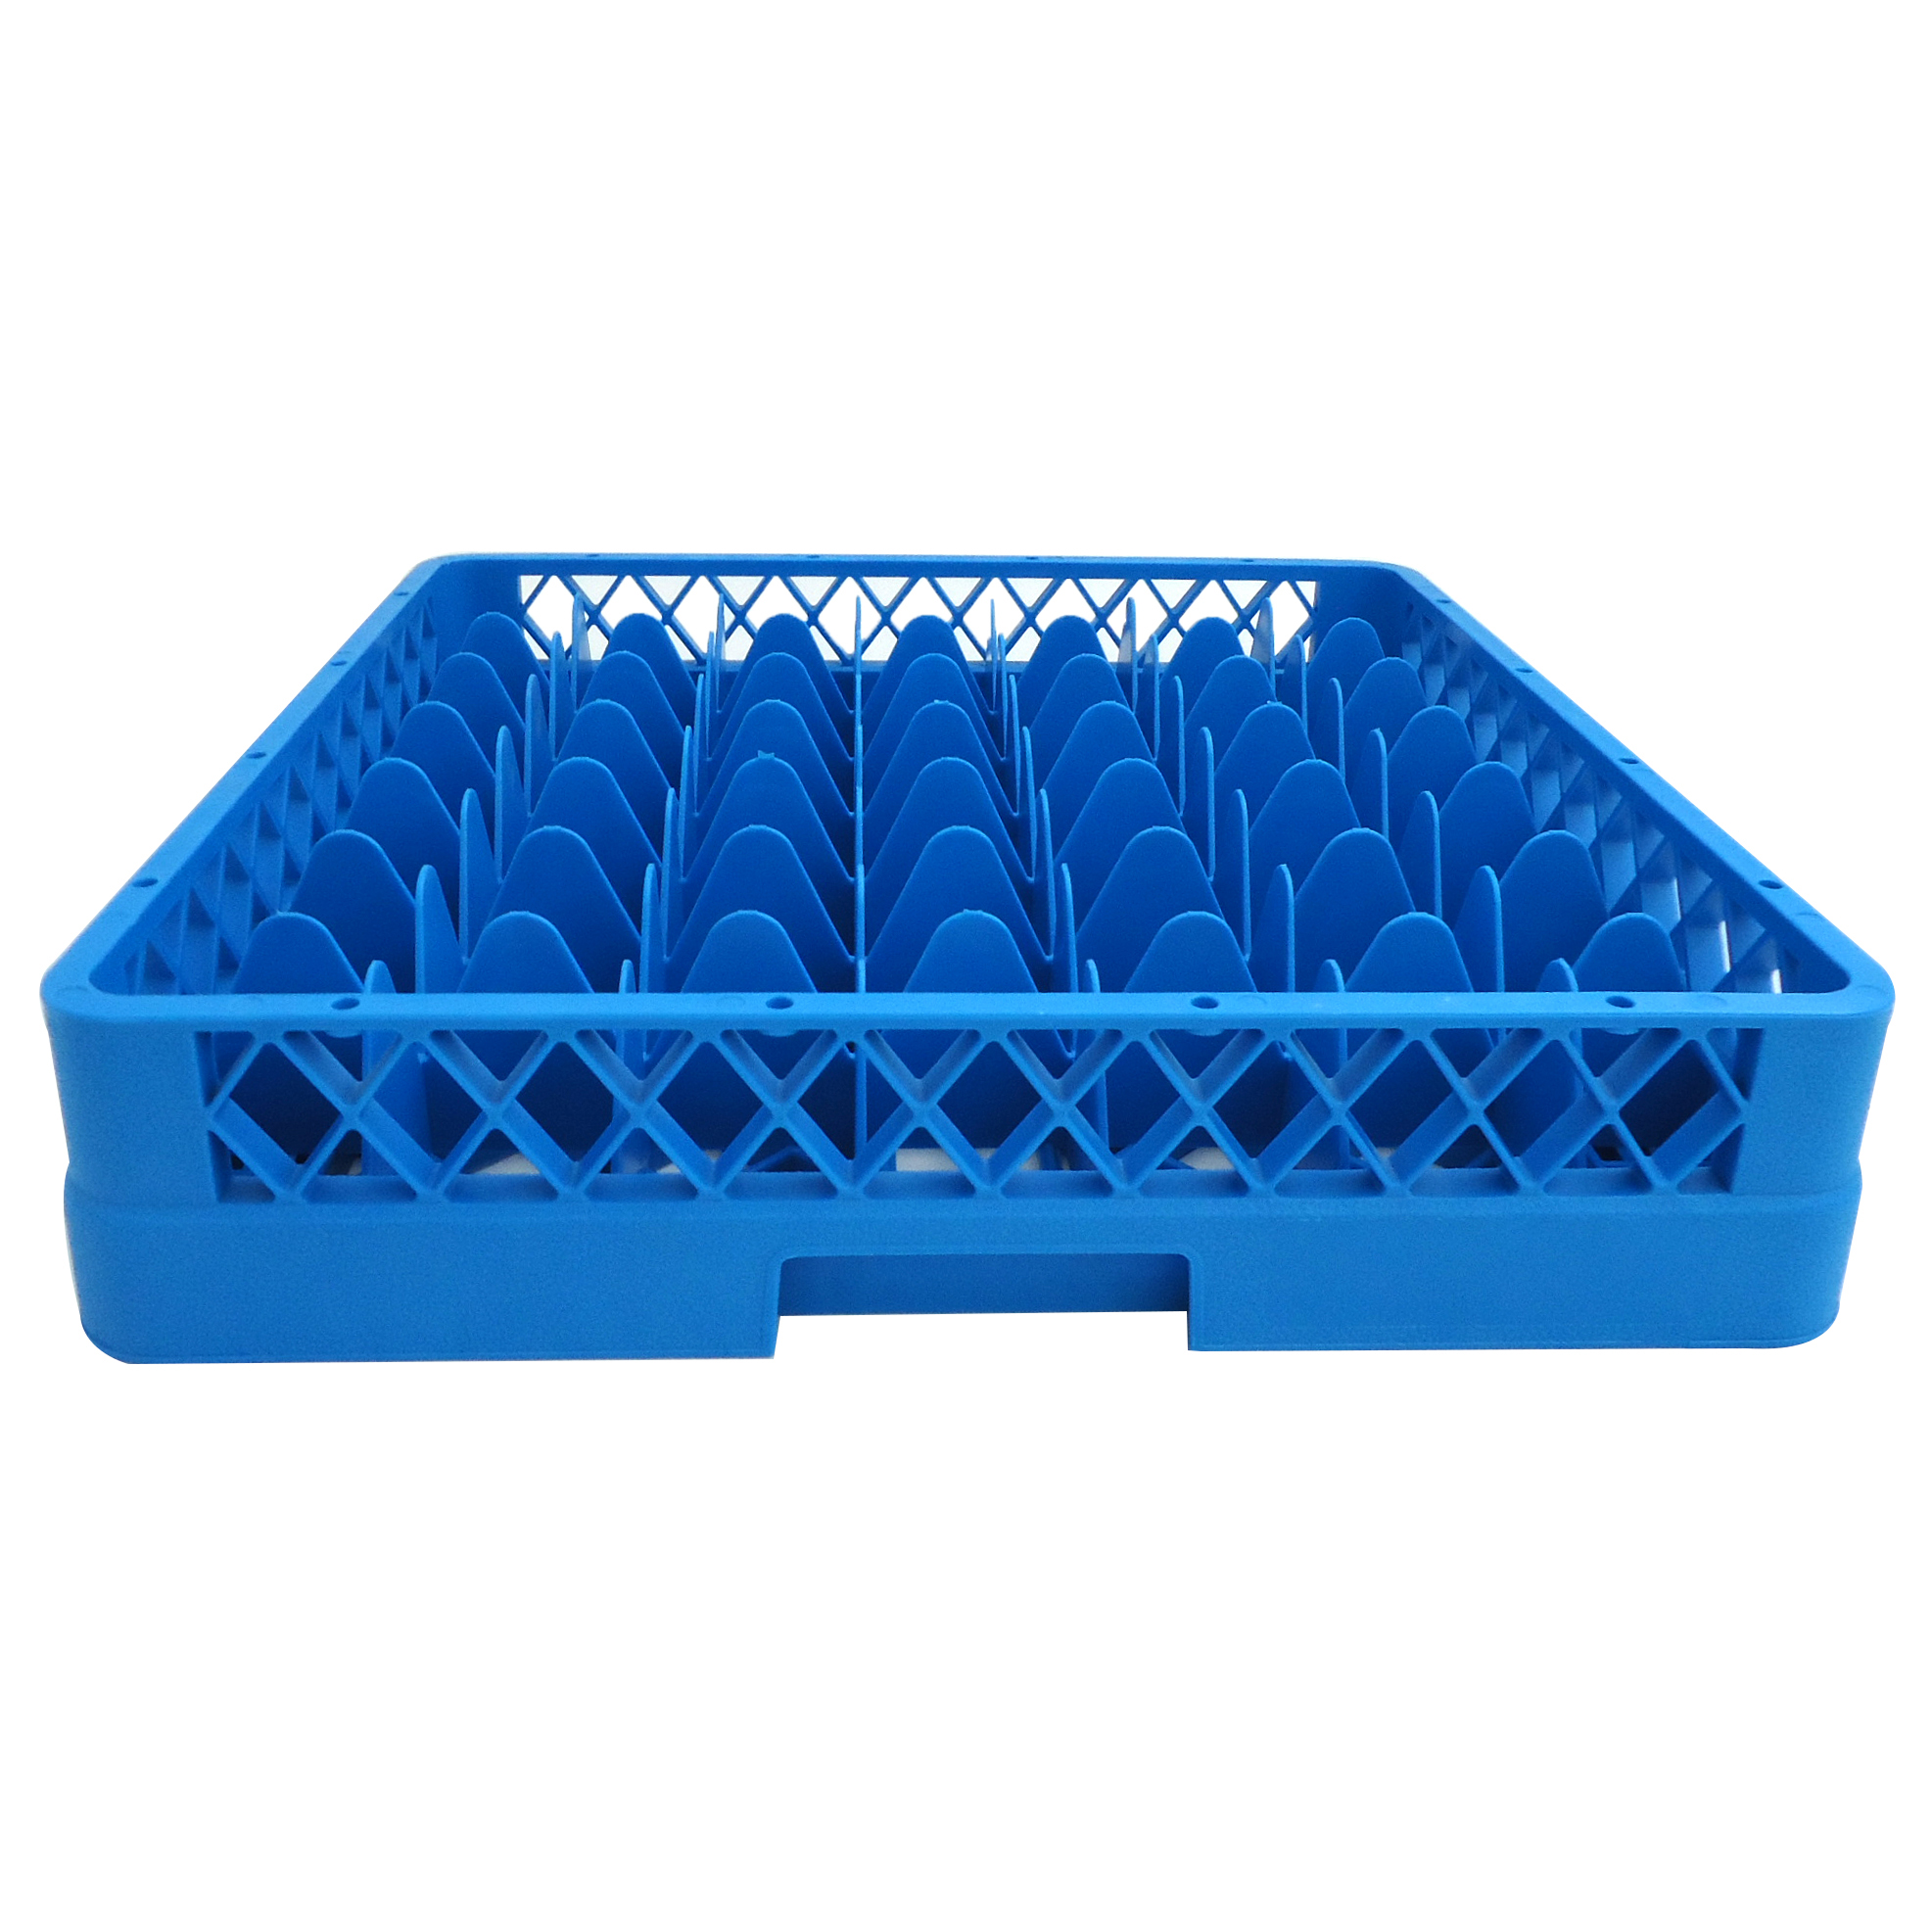 Lacor 69249 Καλάθι Πλυντηρίου 49 Θέσεων - 500x500x103mm επαγγελματικός εξοπλισμός   καλάθια πλυντηρίων  επαγγελματικός εξοπλισμός   πλυν